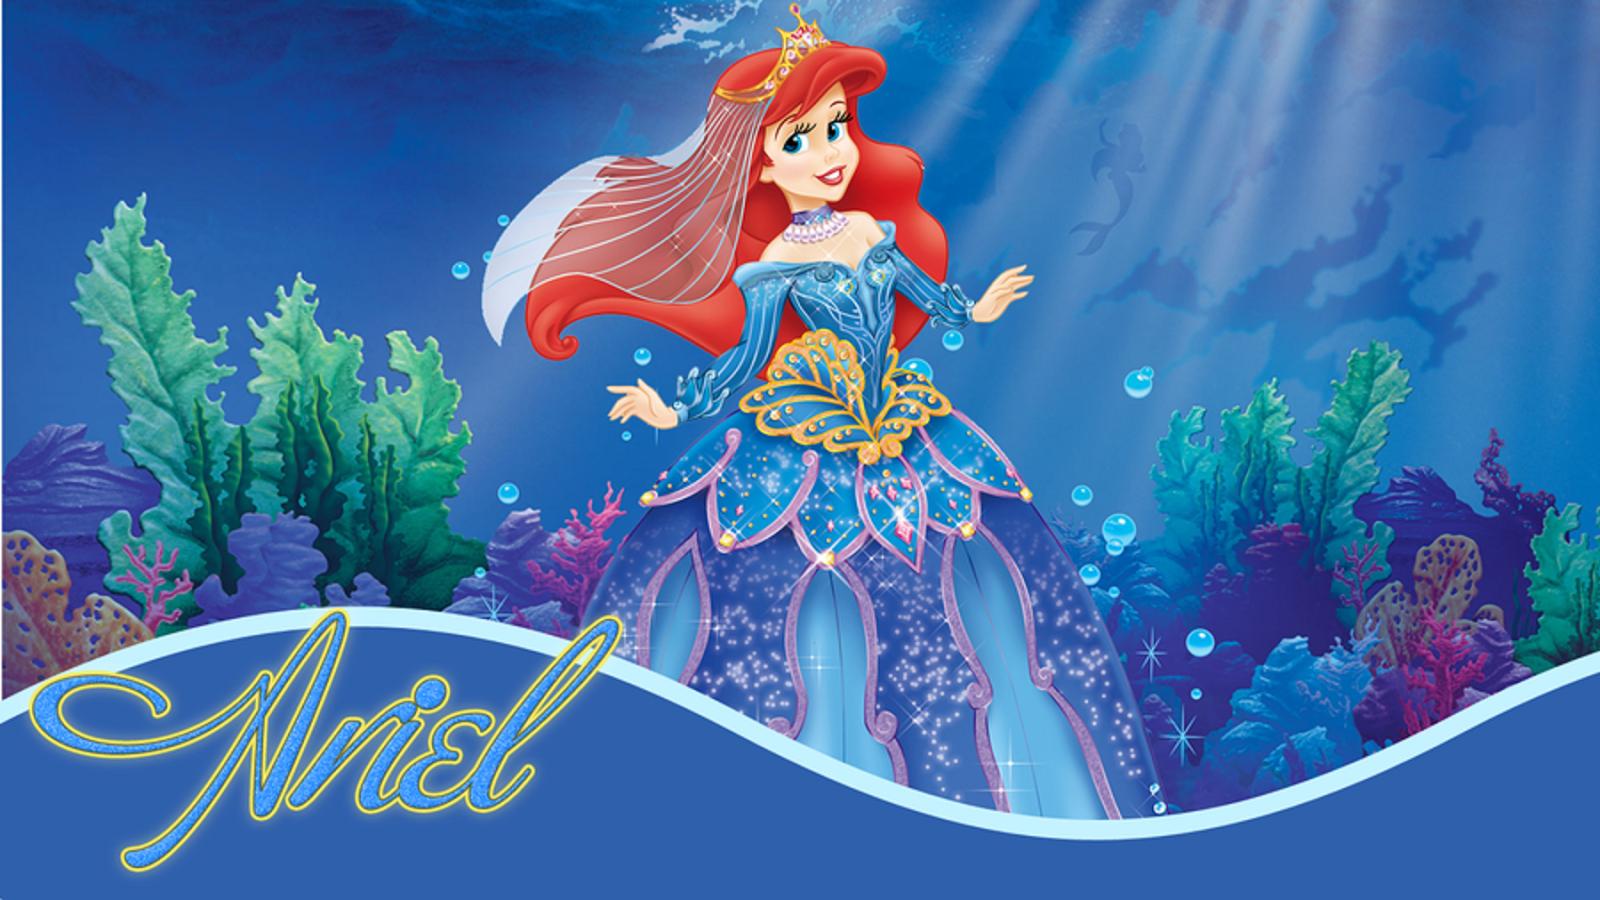 Disney Desktop Wallpaper Hd: Disney HD Wallpapers: Walt Disney Princess Ariel HD Wallpapers